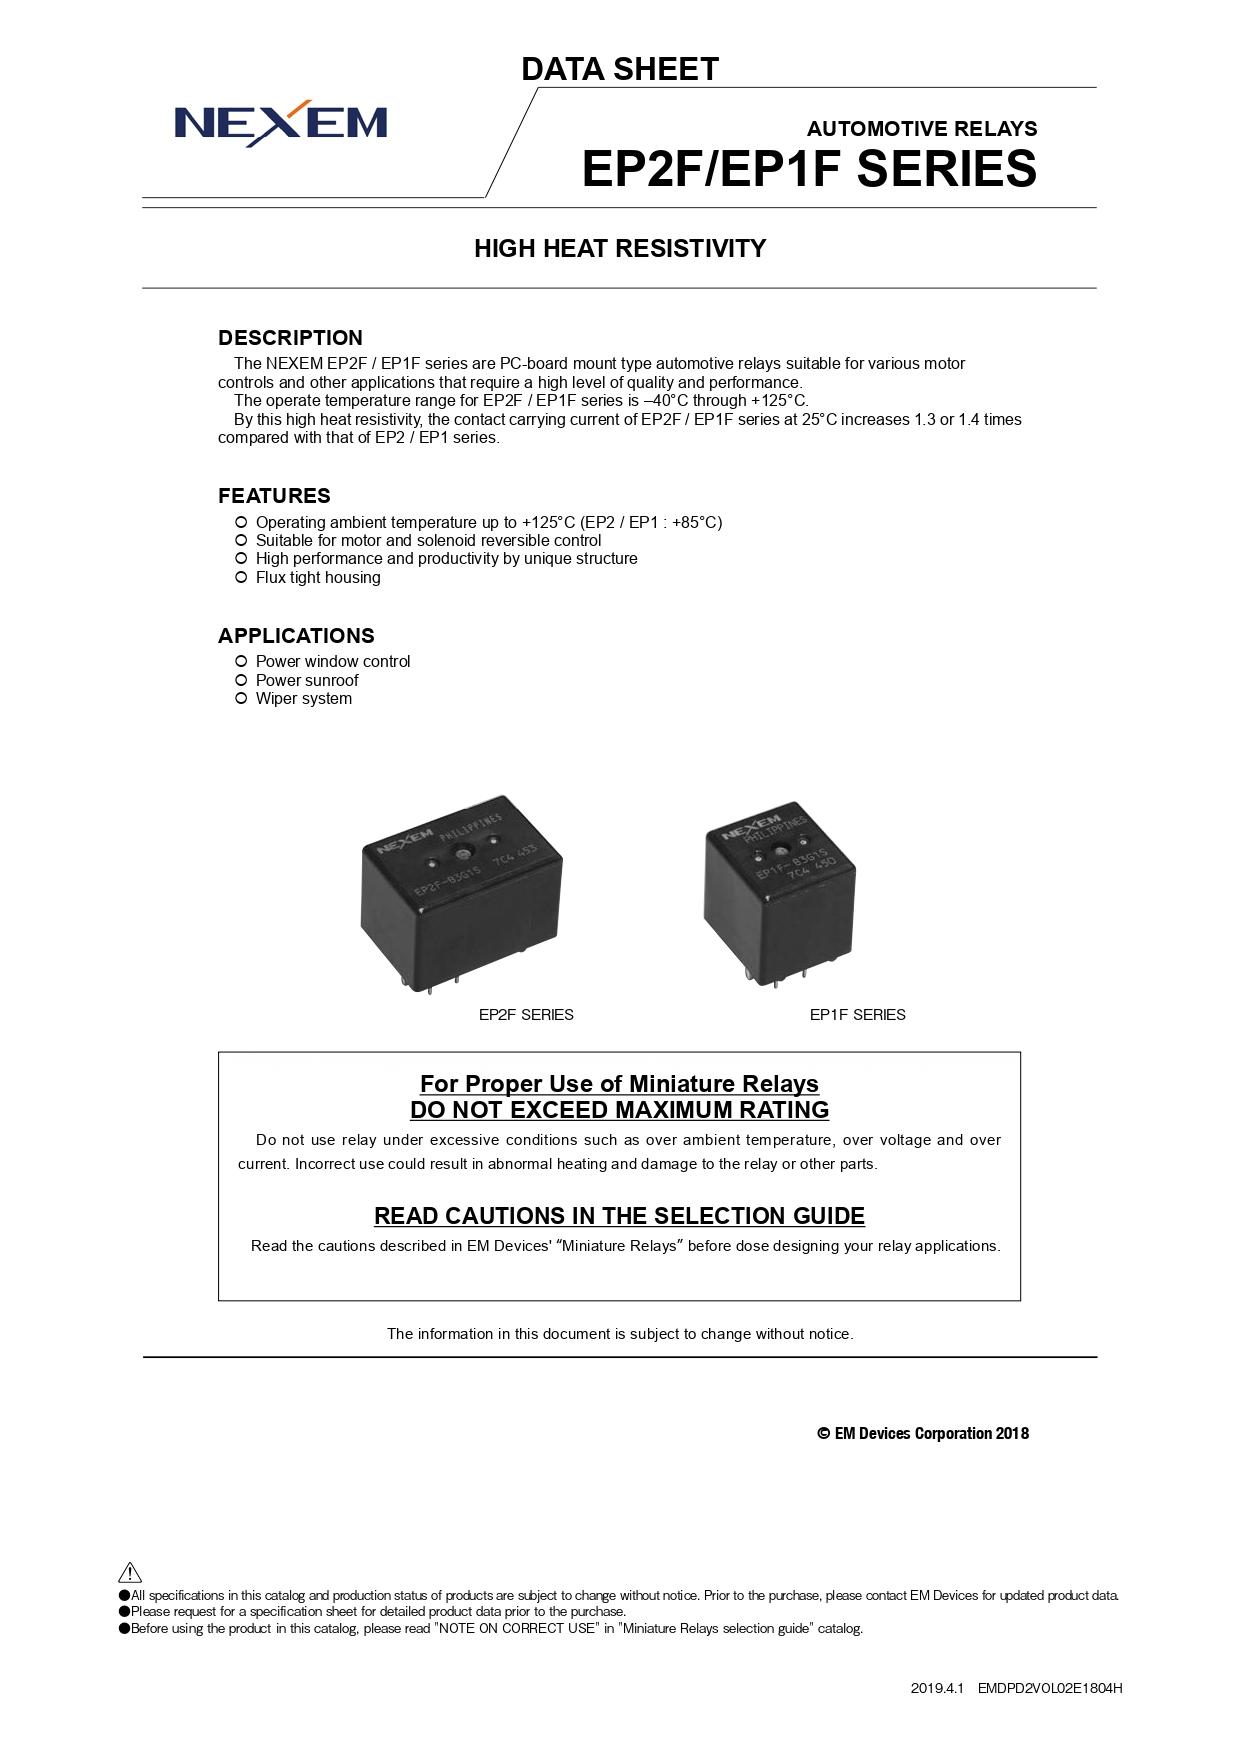 Miniature Power Relay Data Sheet pdfimage